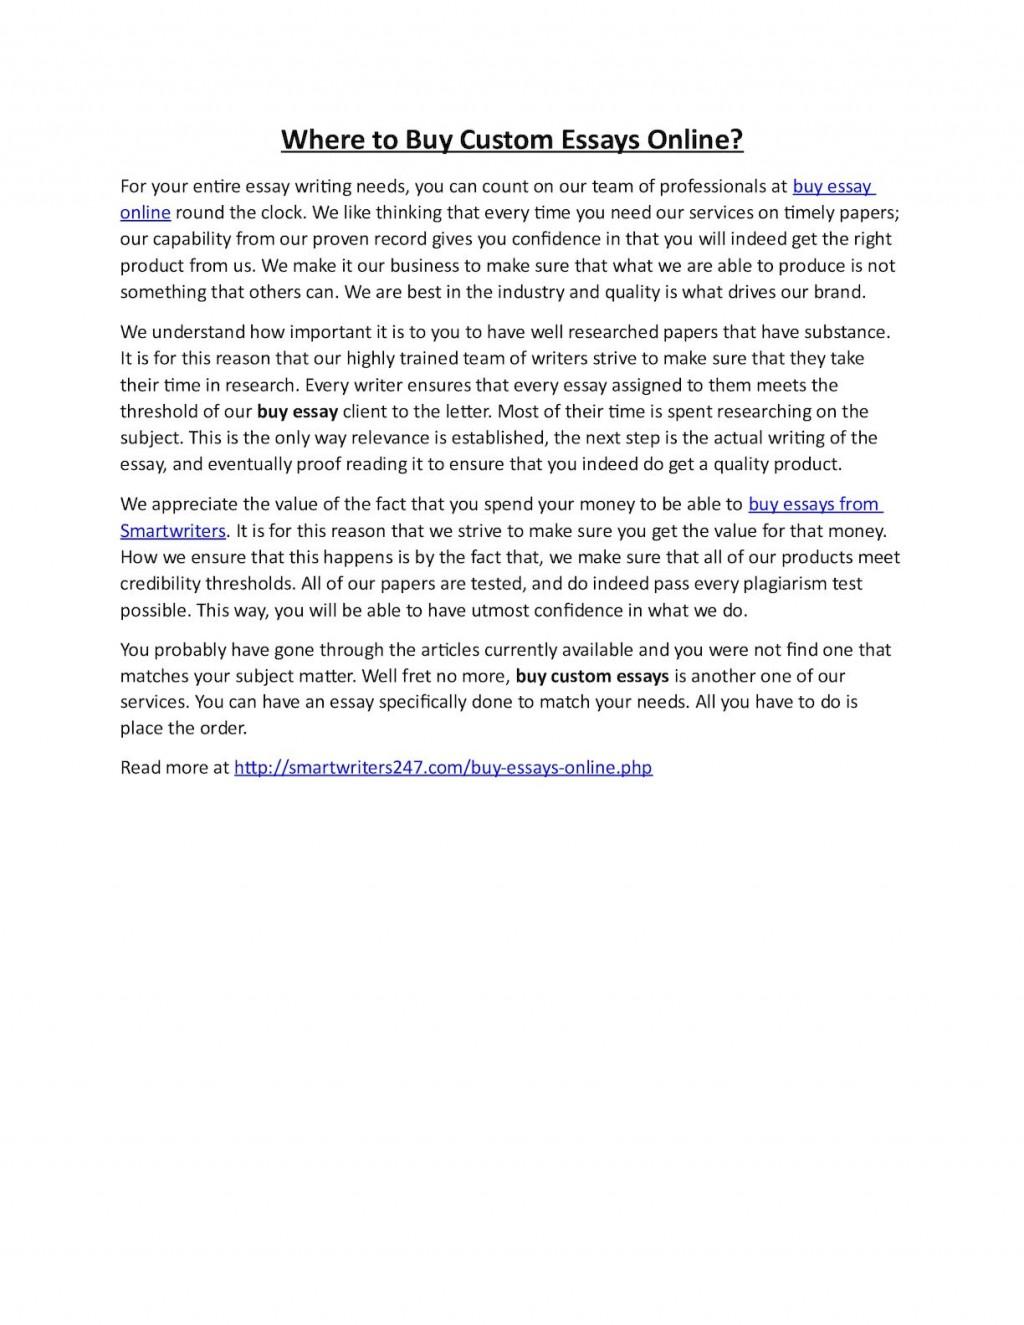 010 Essay Example P1 Buy Custom Essays Impressive Online Large